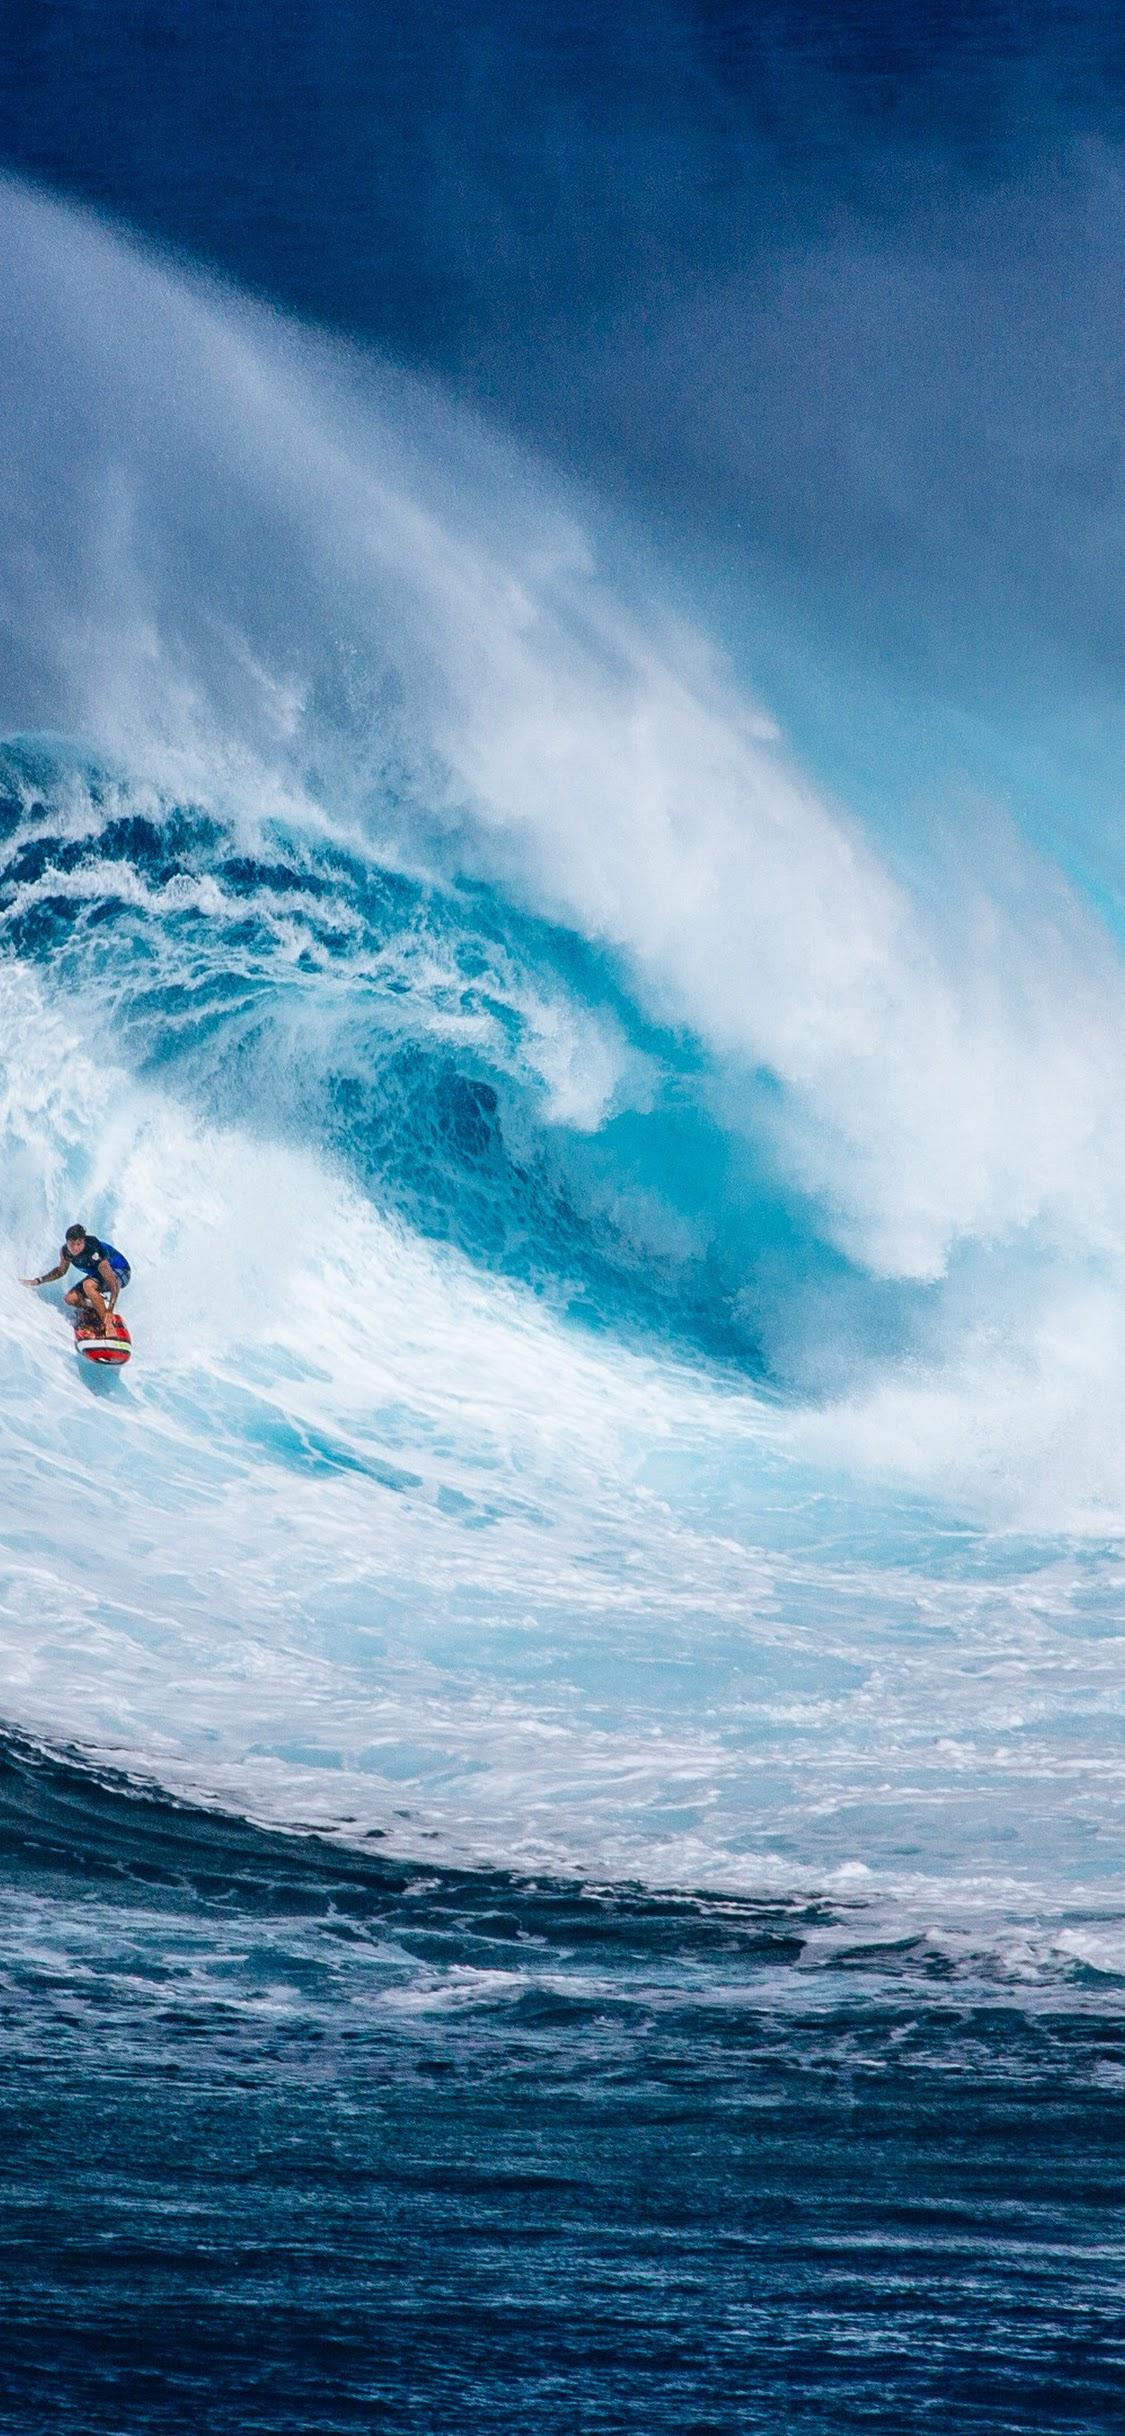 Surfing Ocean Waves Nature Scenery 4k Wallpaper 180